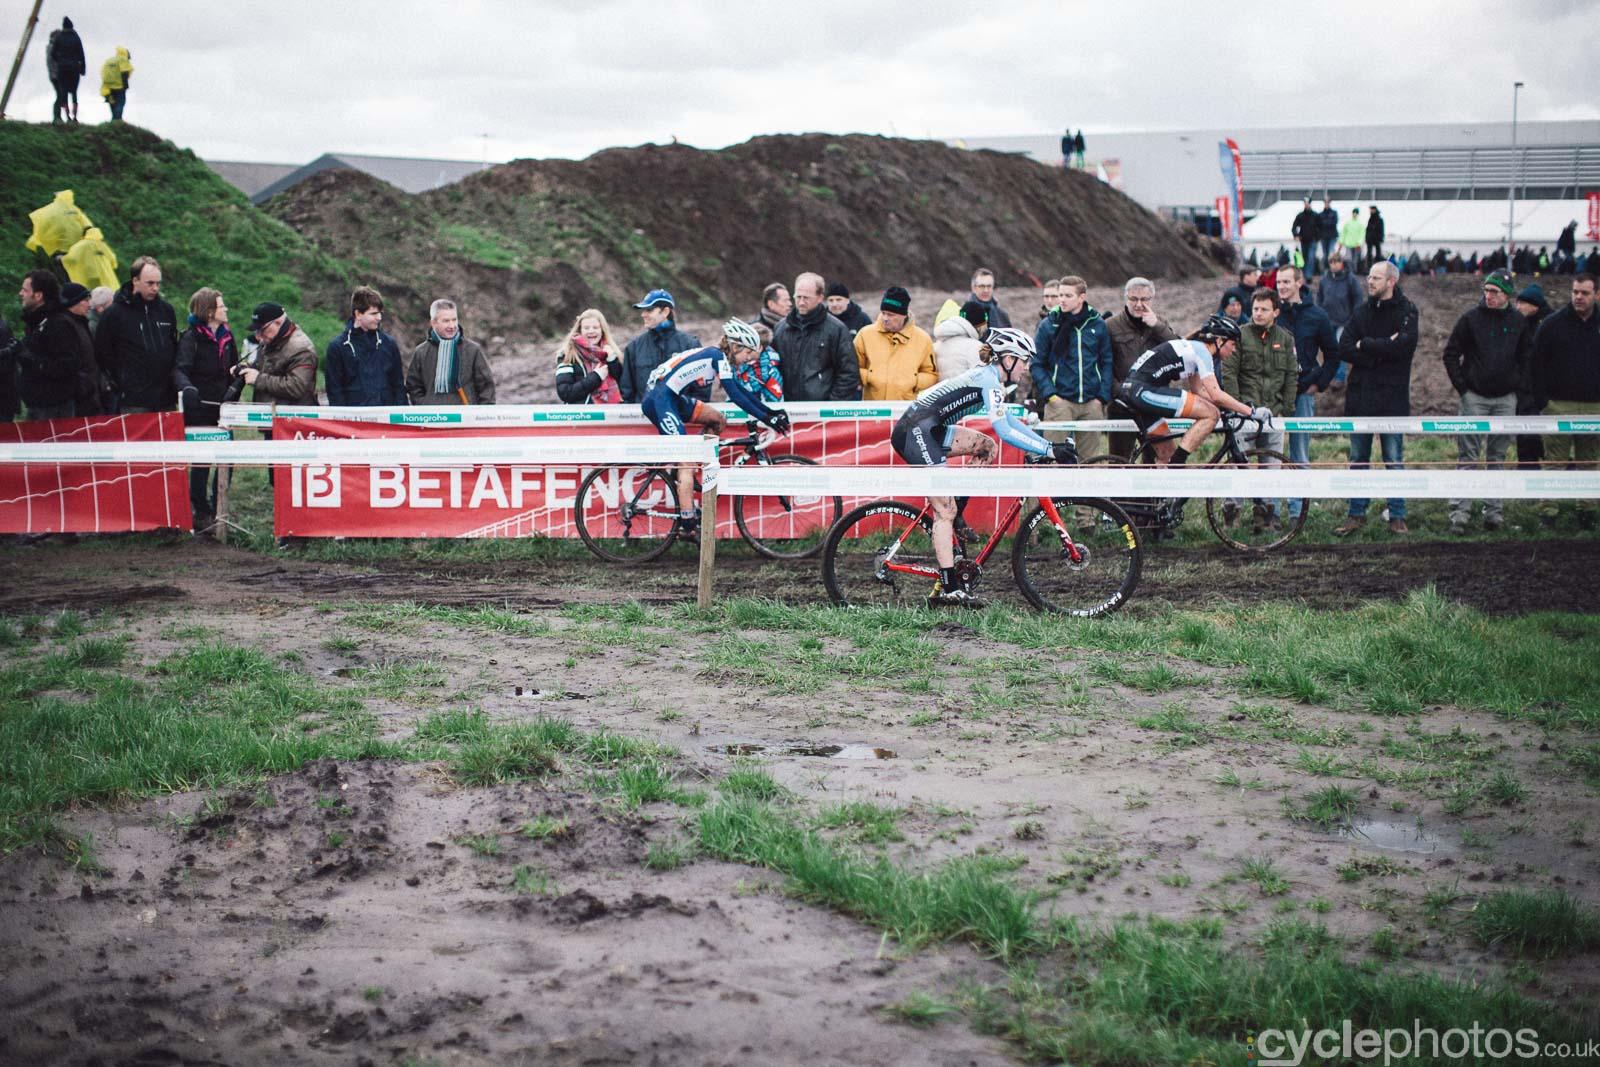 2016-cyclephotos-cyclocross-hoogstraten-140102-sophia-gomez